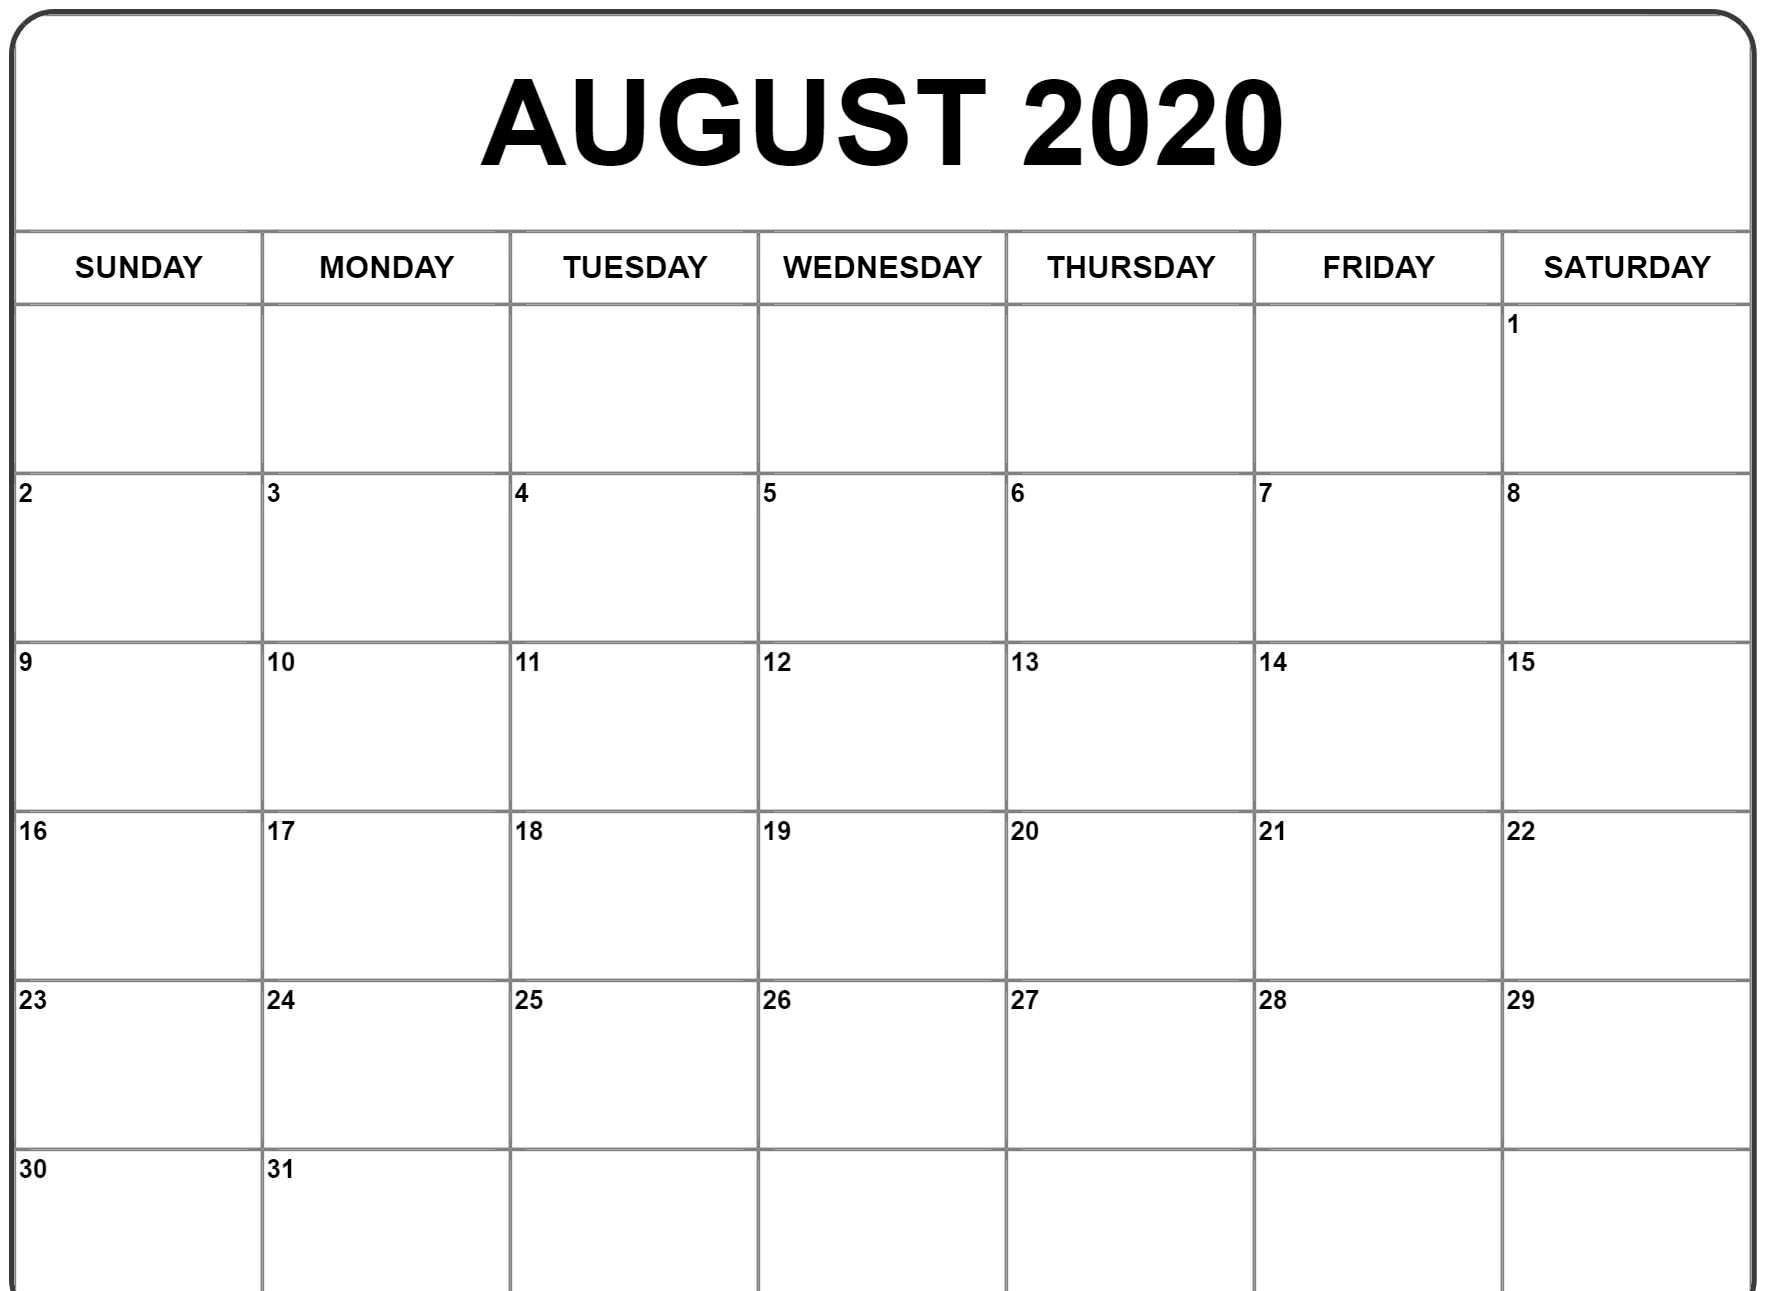 August 2020 Calendar Pdf, Word, Excel Printable Template-January 2020 Calendar Xl